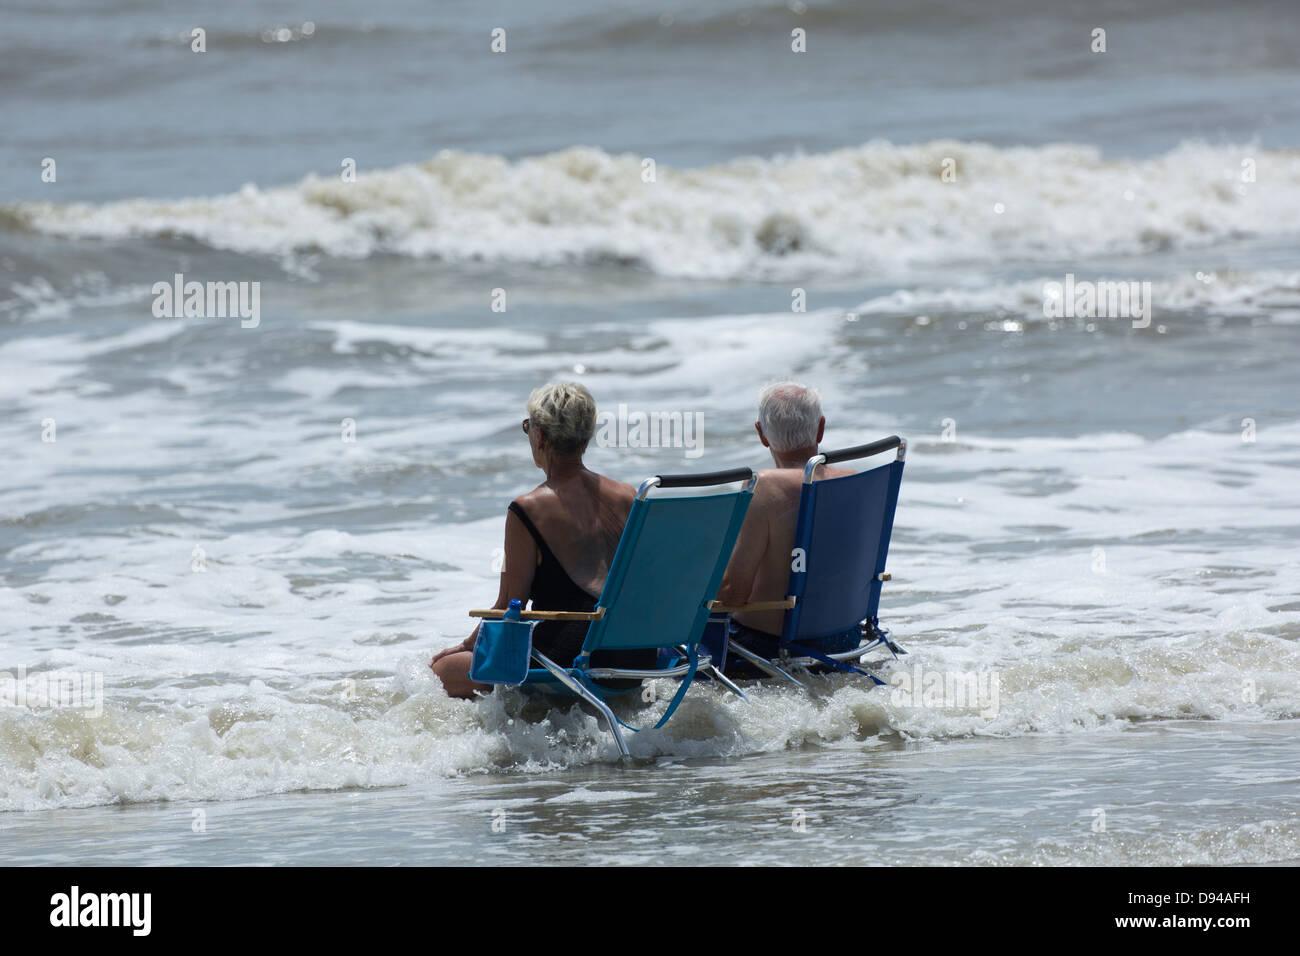 Sunning Seniors Stock Photos & Sunning Seniors Stock Images - Alamy